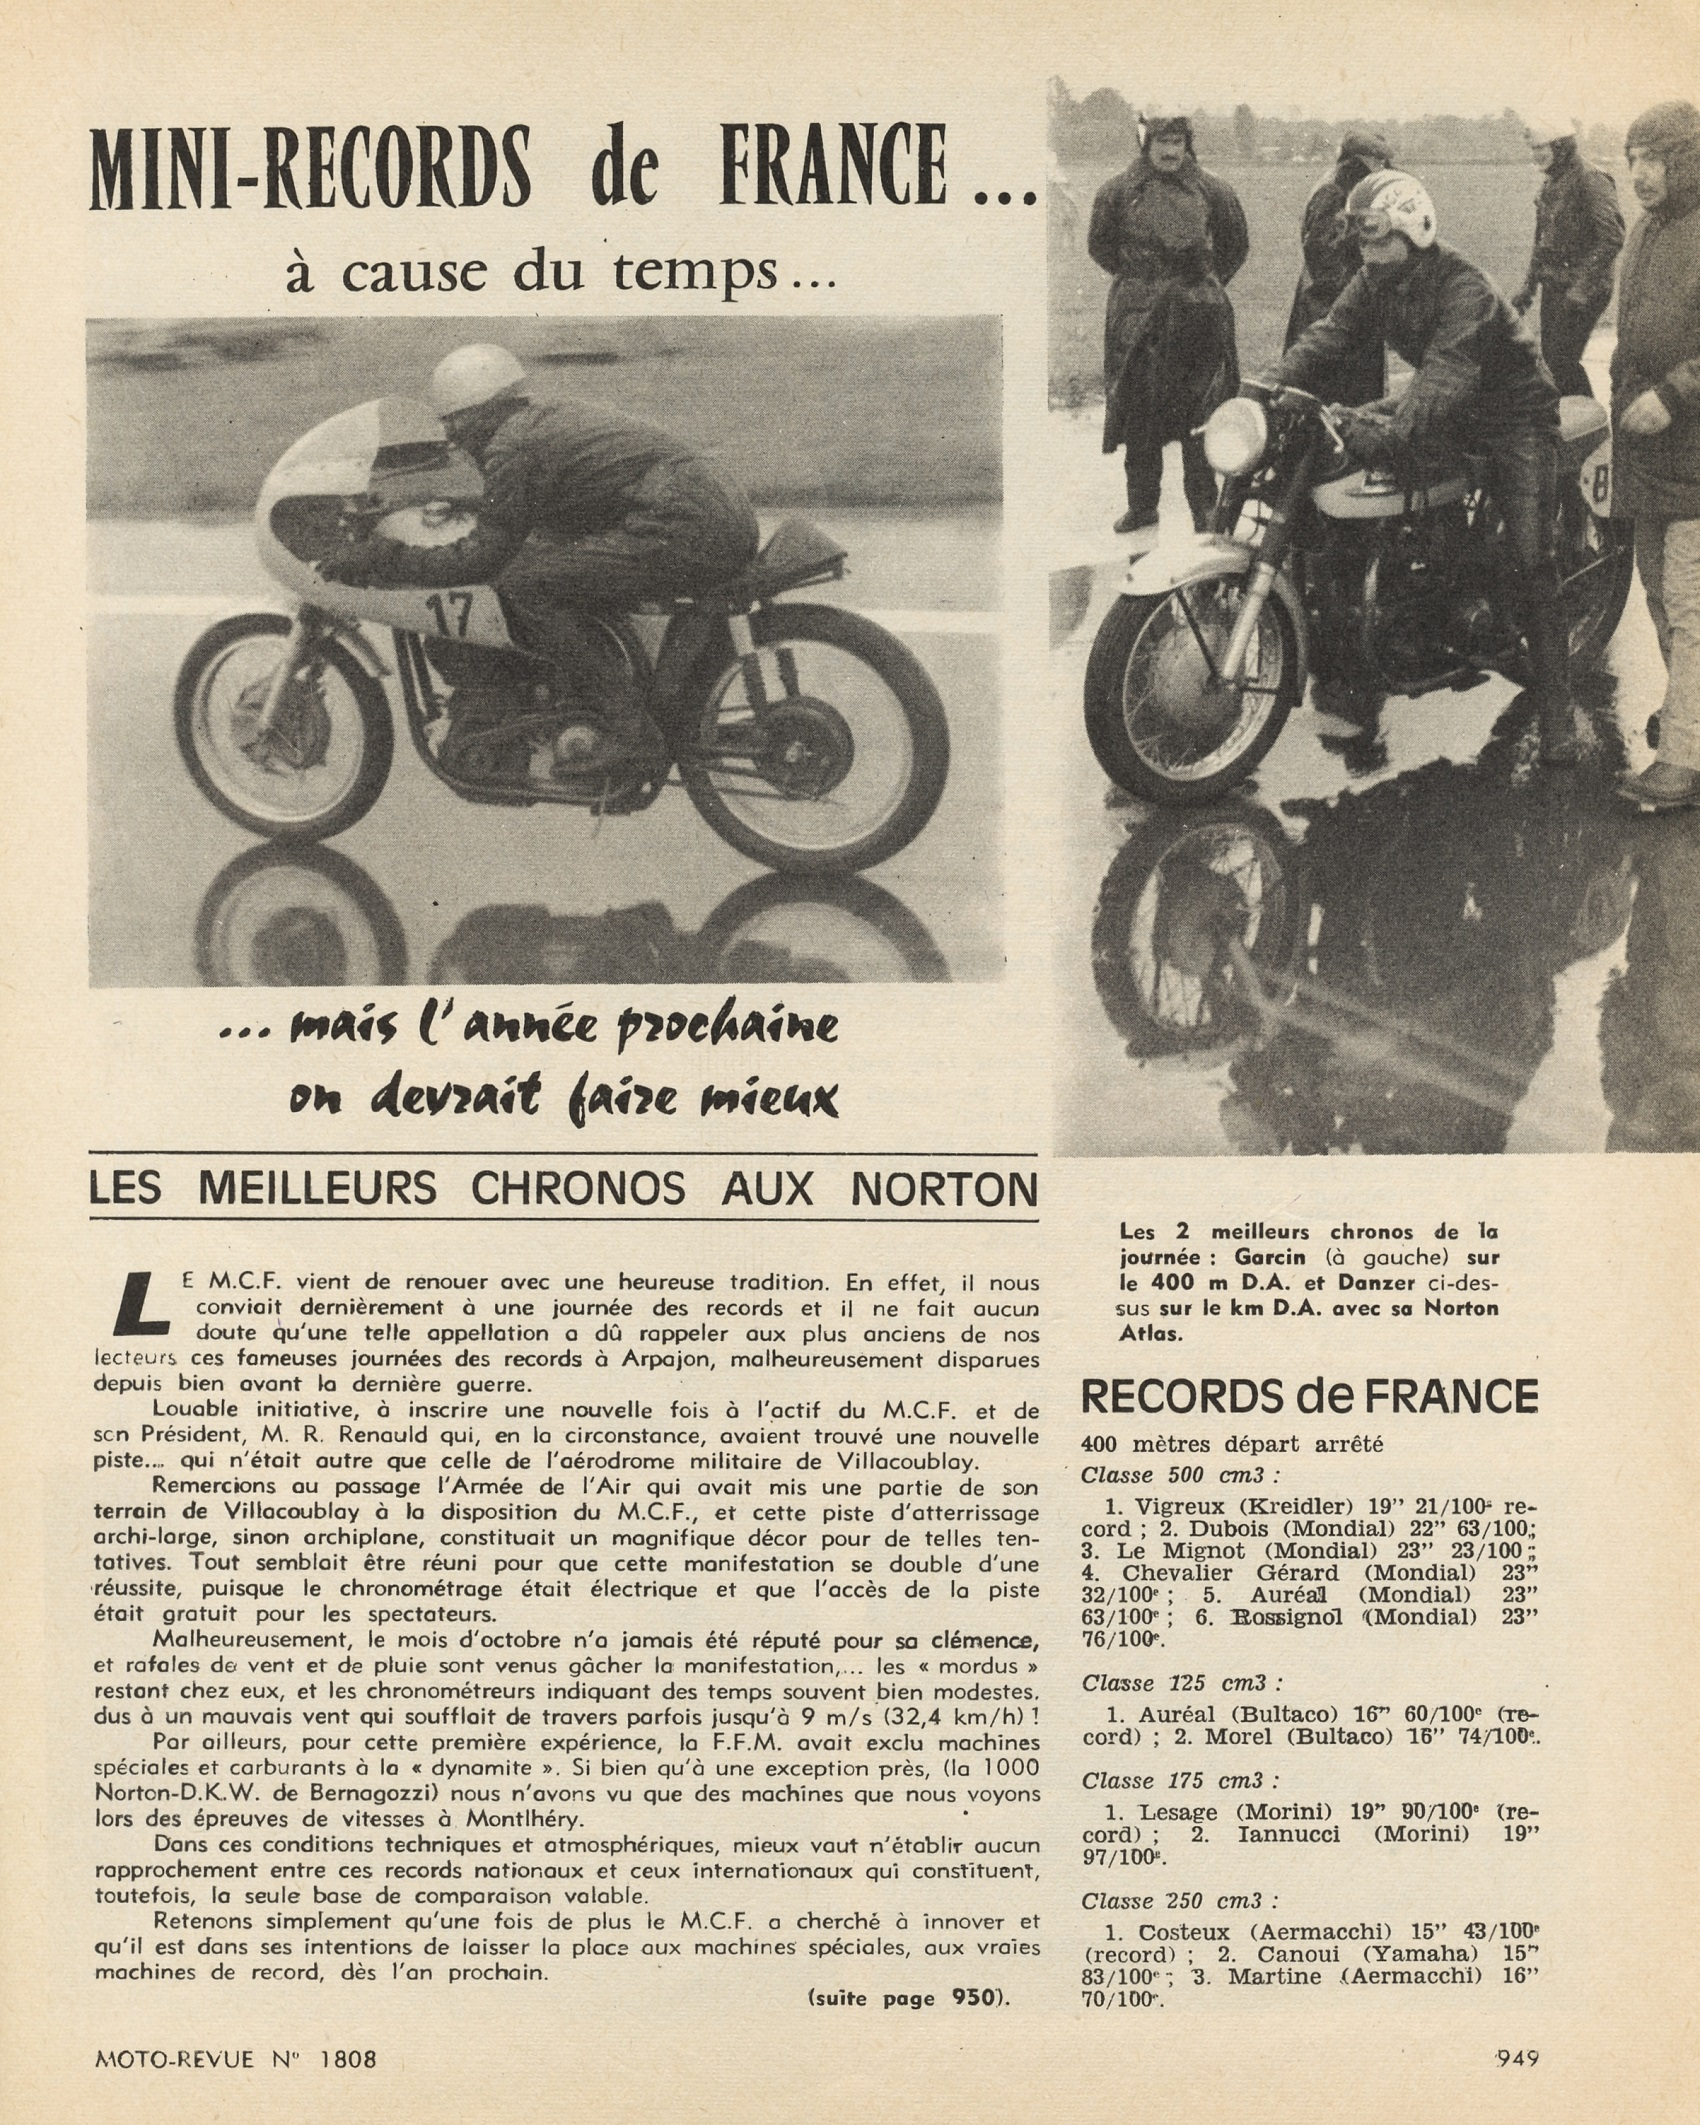 Records de vitesse de Villacoublay 1966 A45e298e5f7b430b039364720cb13d82fa6eceb4